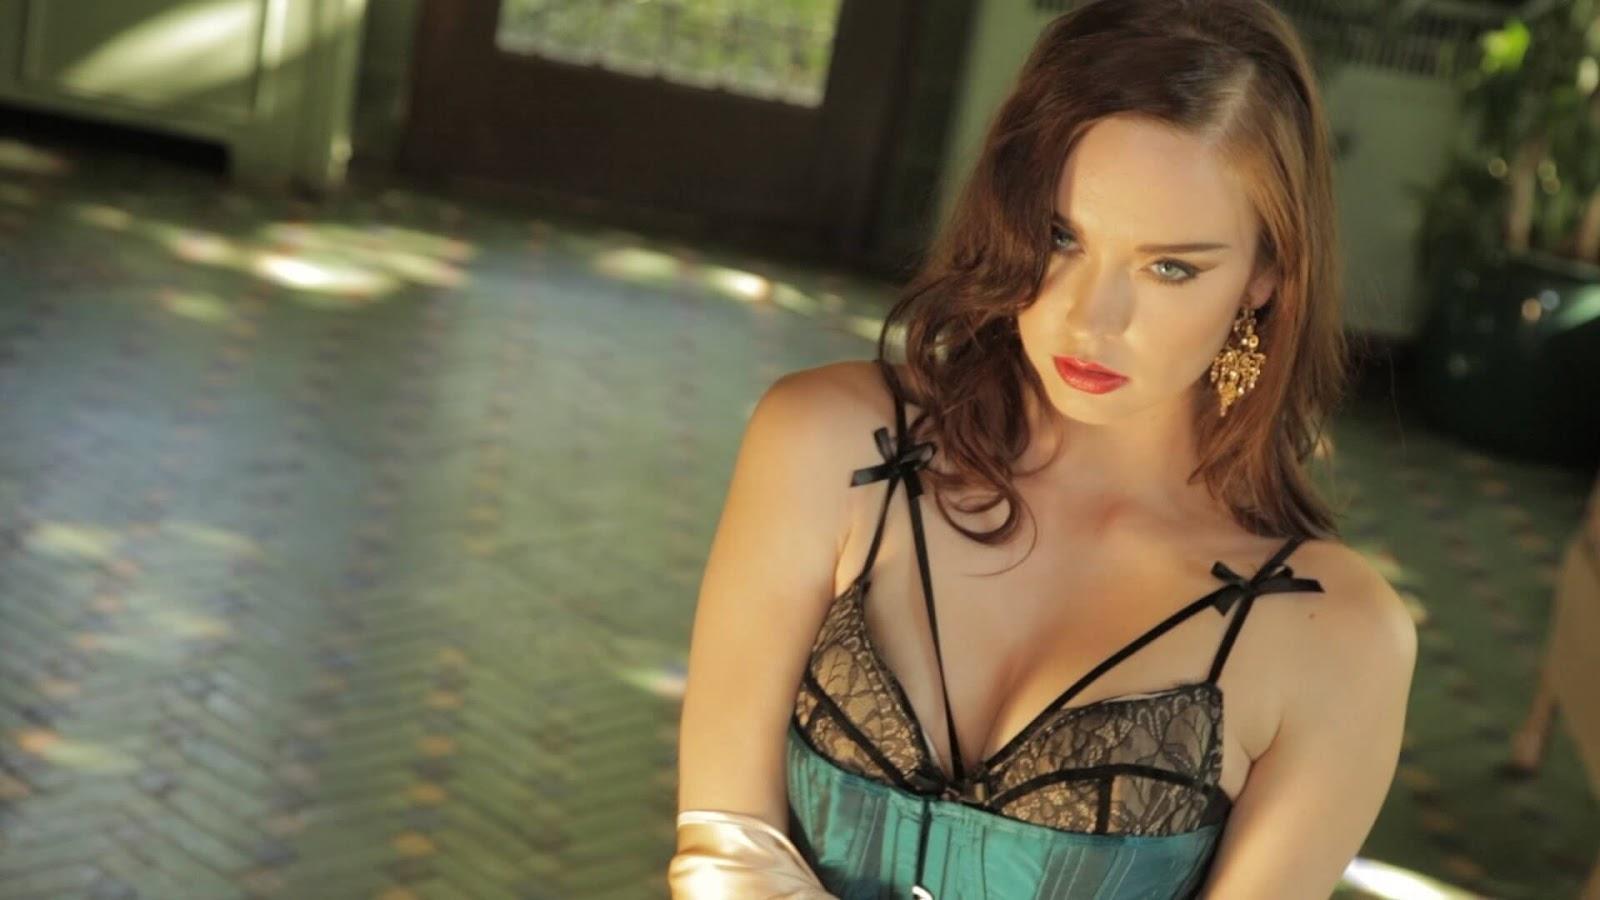 Amanda Detmer Wiki elyse levesque wiki & biography, age, weight, height, friend